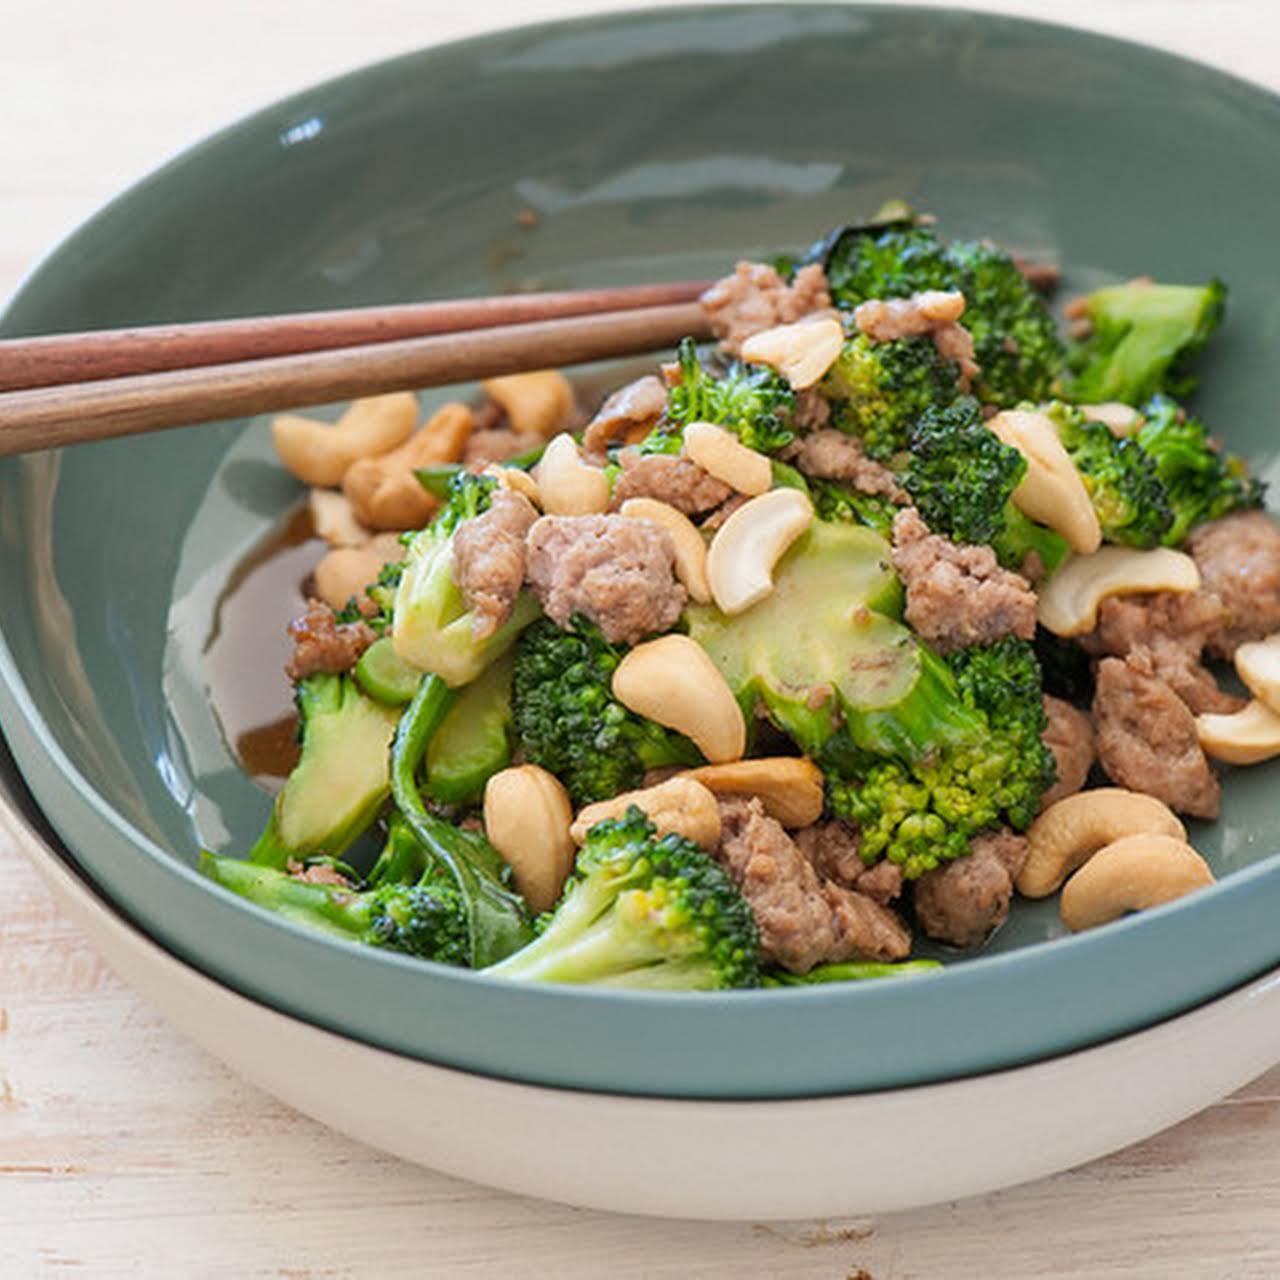 Asian Pork & Broccoli